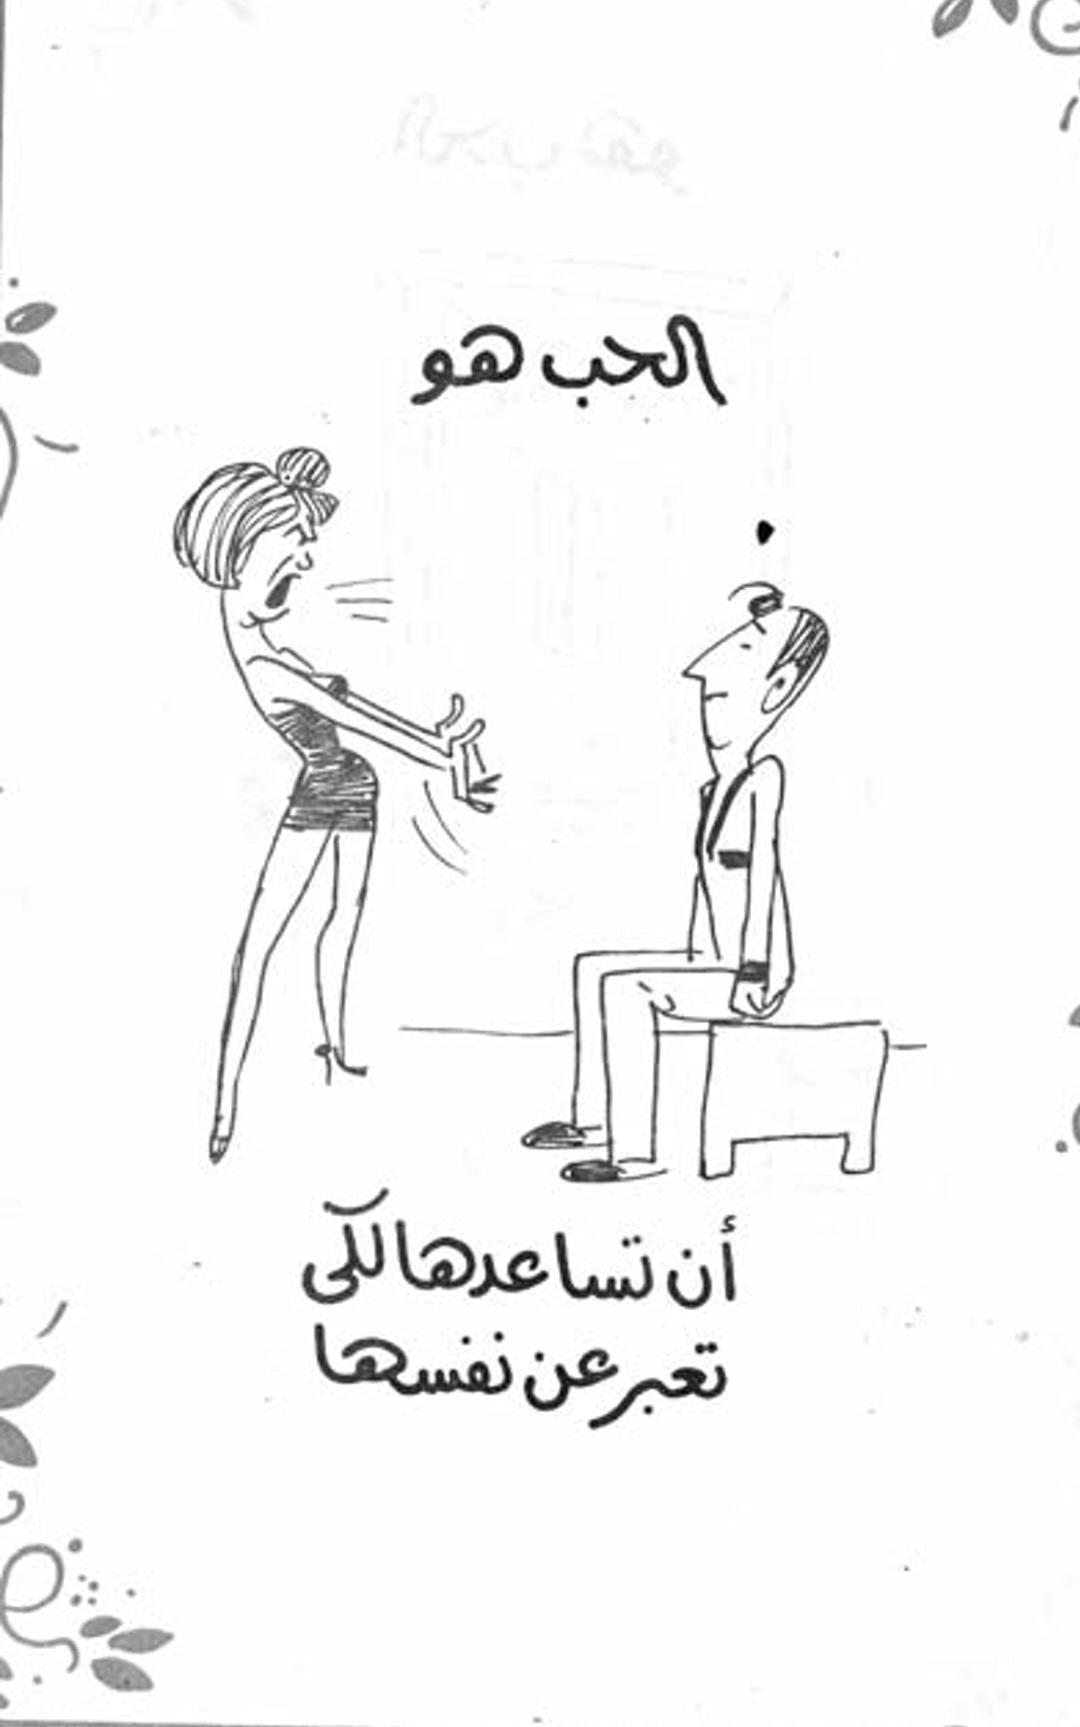 الحب هو احمد رجب مصطفي حسين كاركتير مصري Love Is Ahmed Ragab Mostafa Hussein Egyptian Caricature Caricature Funny Humor